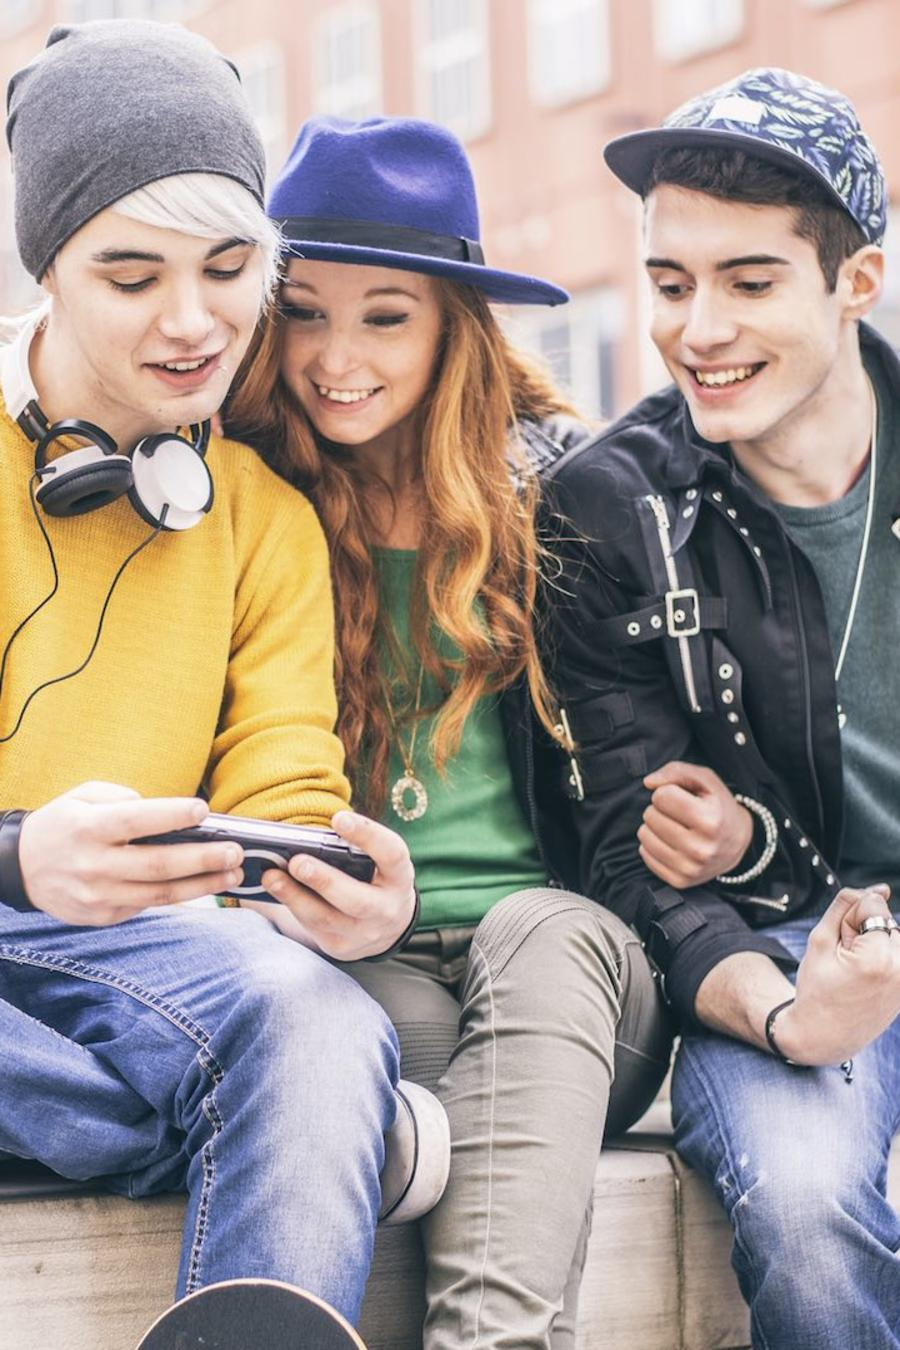 Adolescentes usando un teléfono móvil